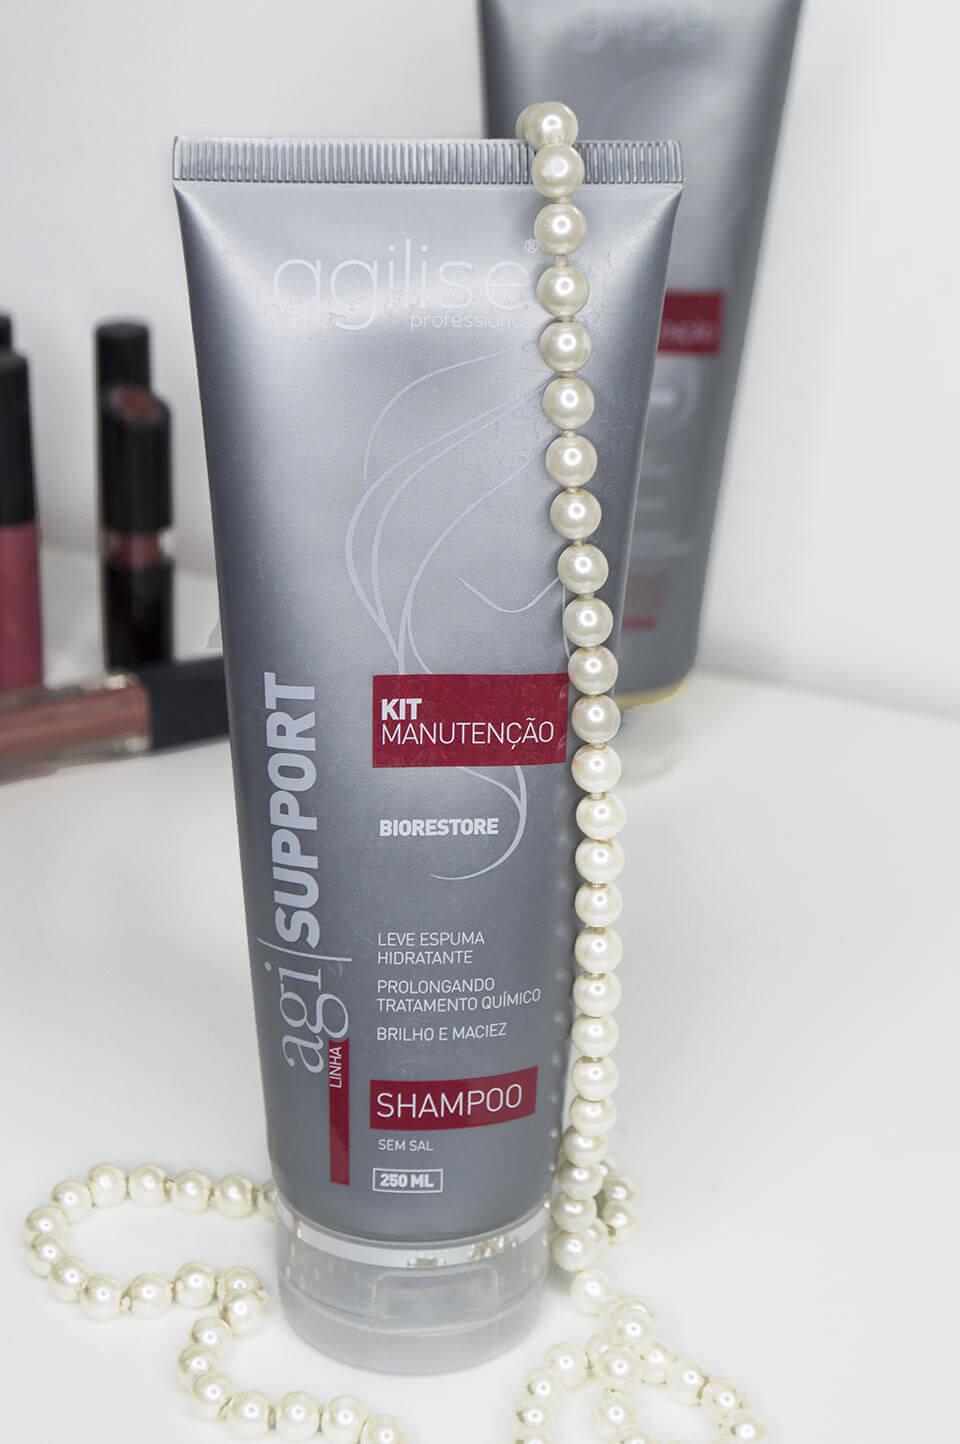 Shampoo Kit Manutenção Agilise Professional